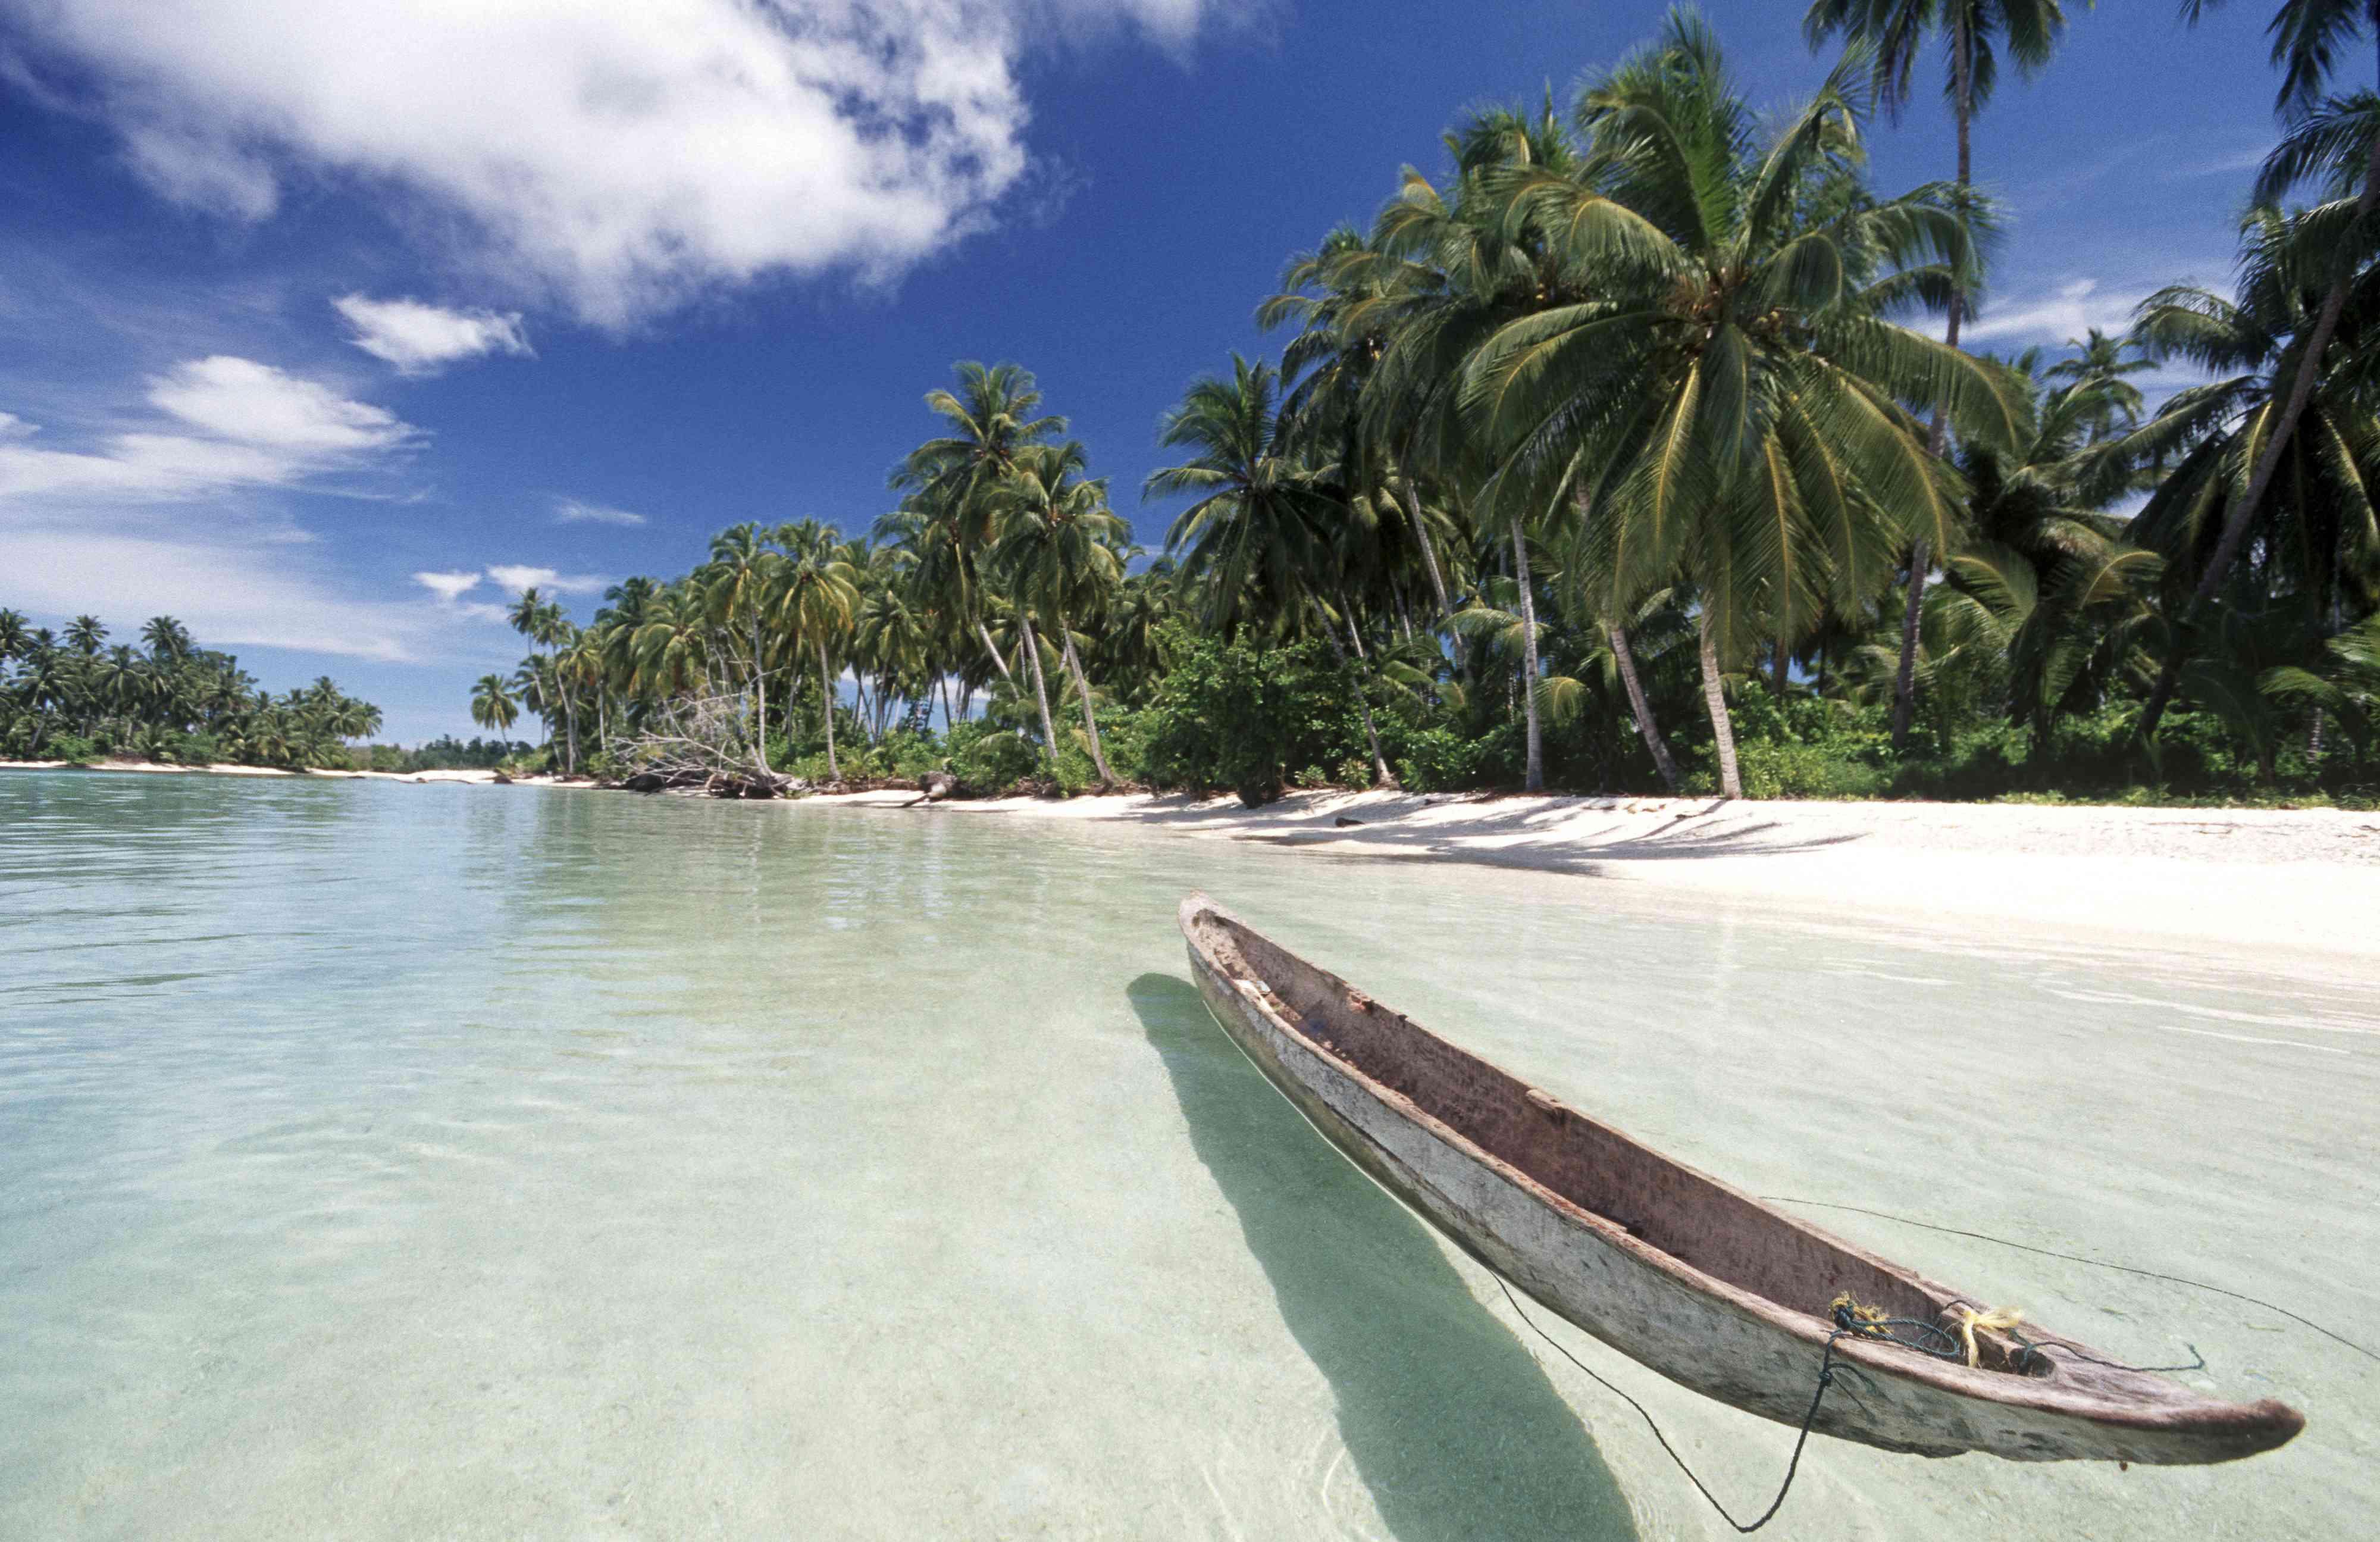 A canoe in the Mentawai Islands, West Sumatra